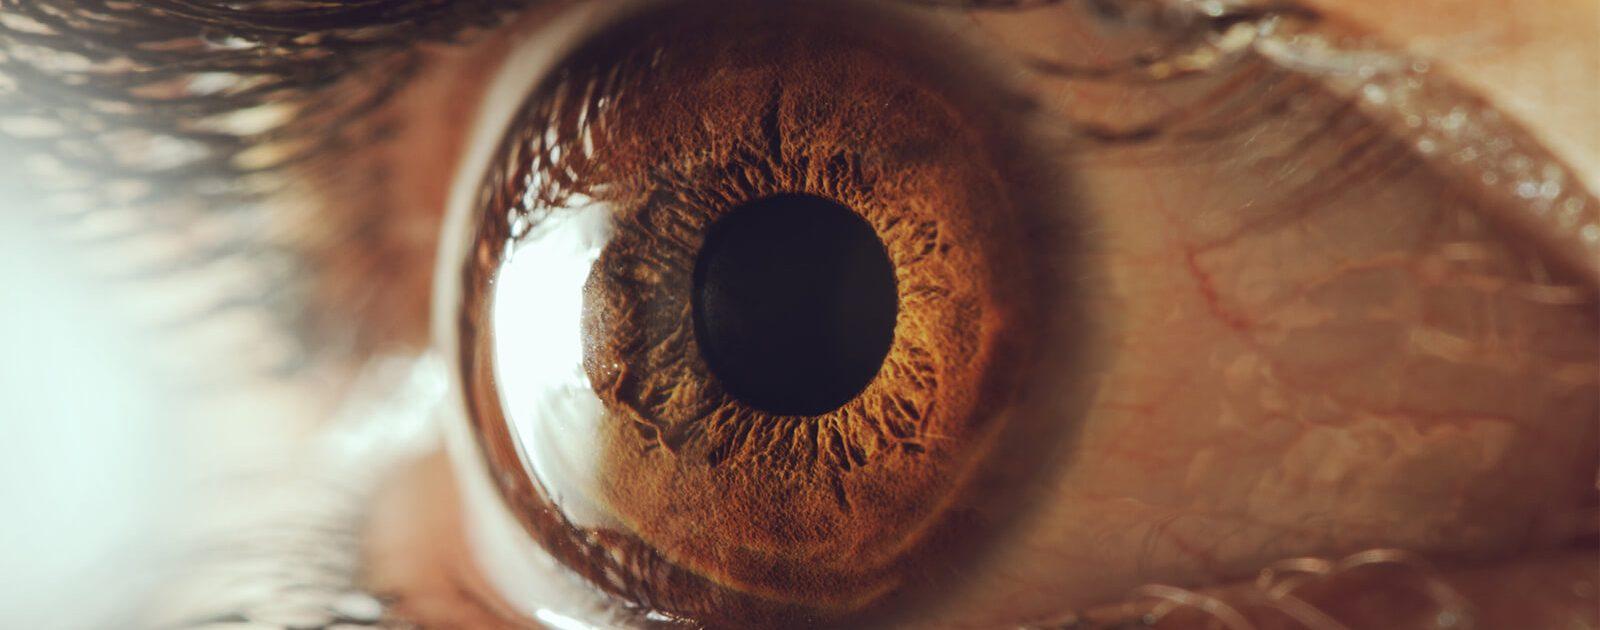 Auge mit Regenbogenhautentzündung.